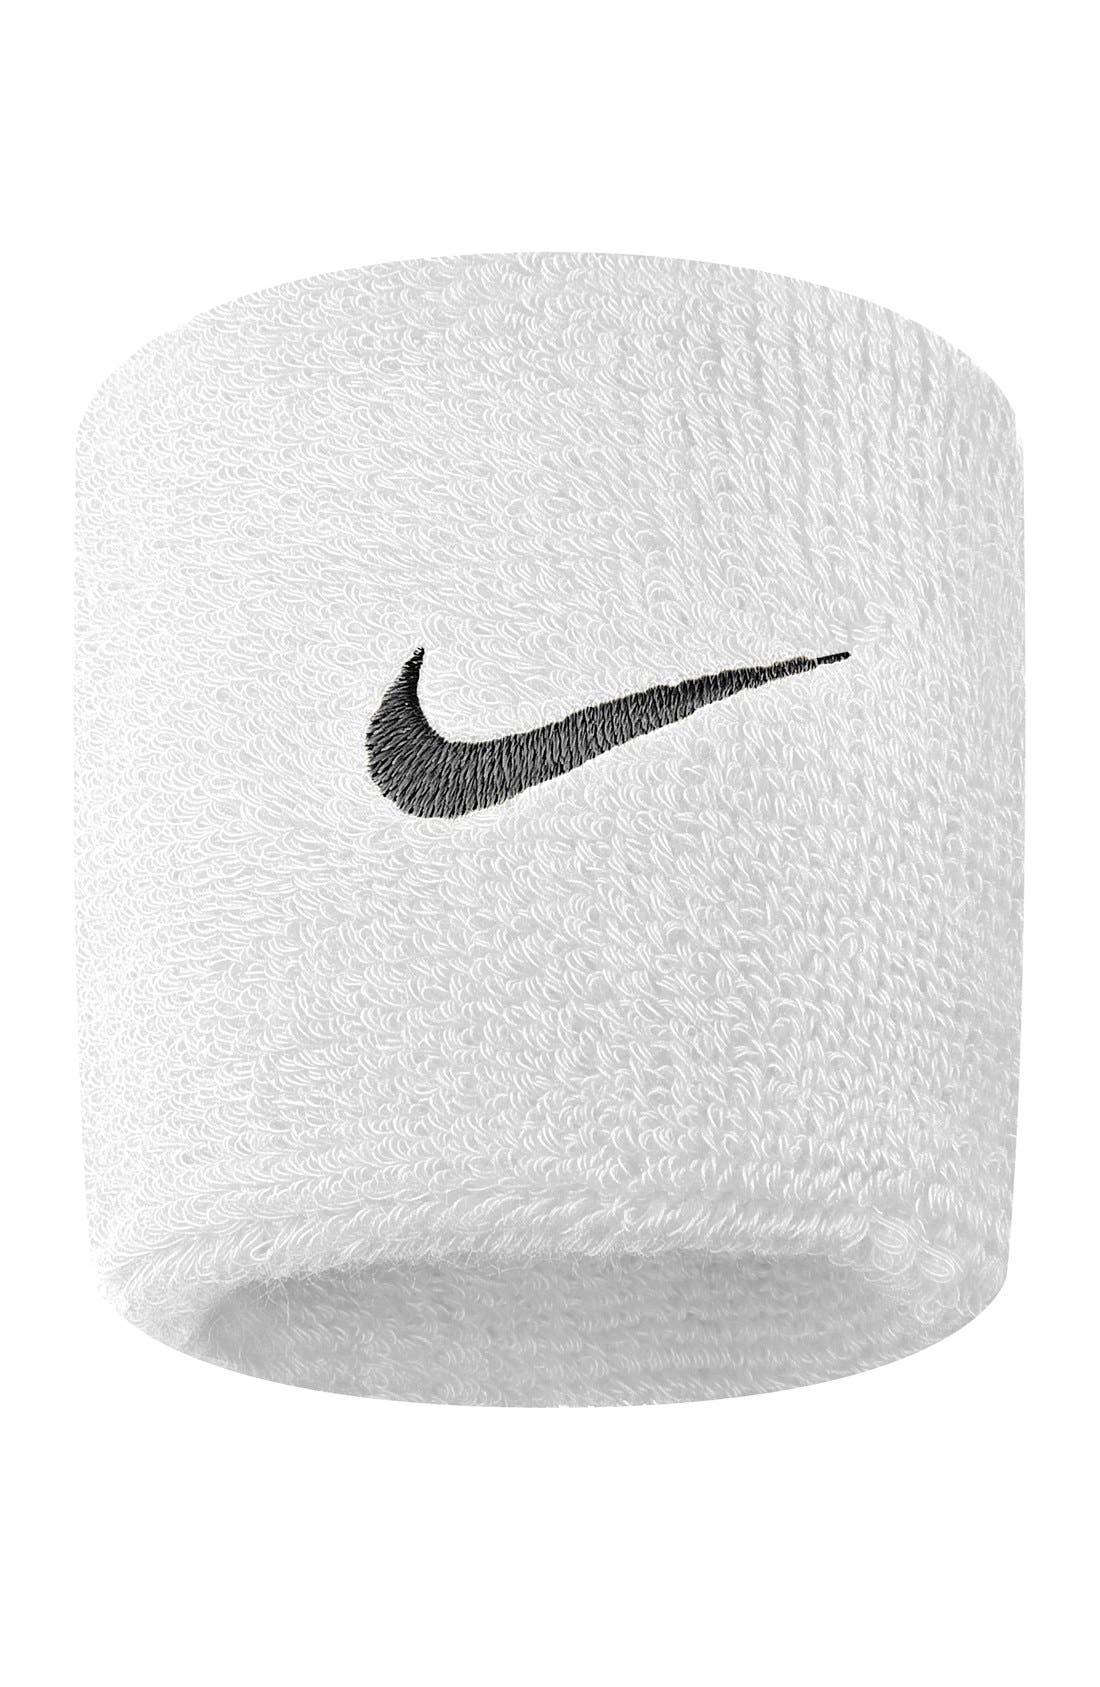 Alternate Image 1 Selected - Nike 'Swoosh' Wristbands